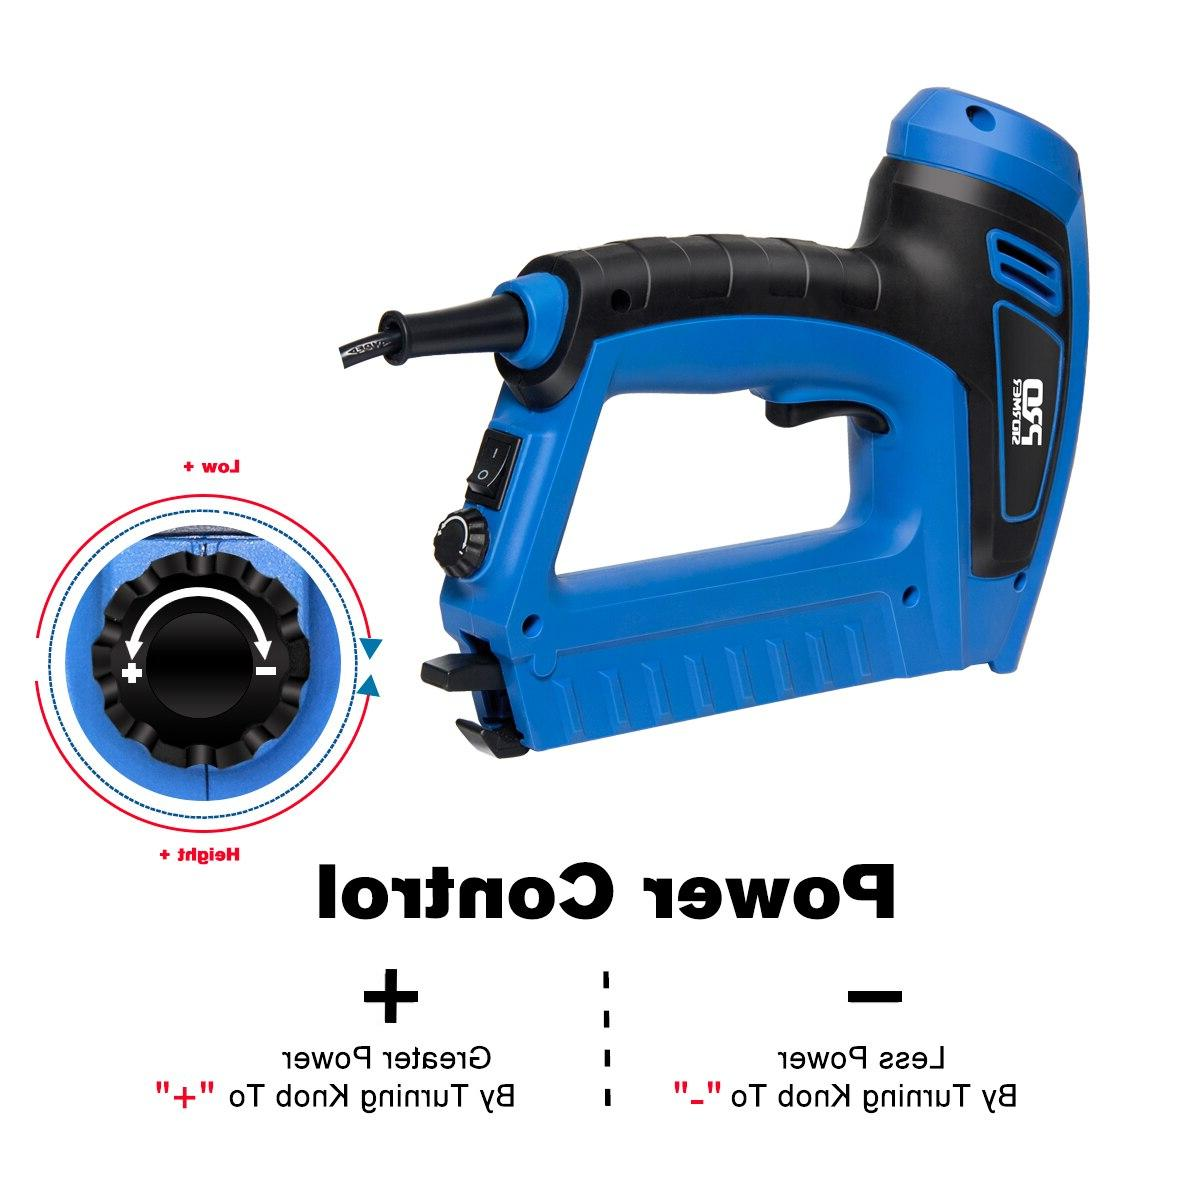 PROSTORMER Electric 2000W <font><b>Power</b></font> Nail Woodworking Upholstery <font><b>Nailer</b></font> Stapler